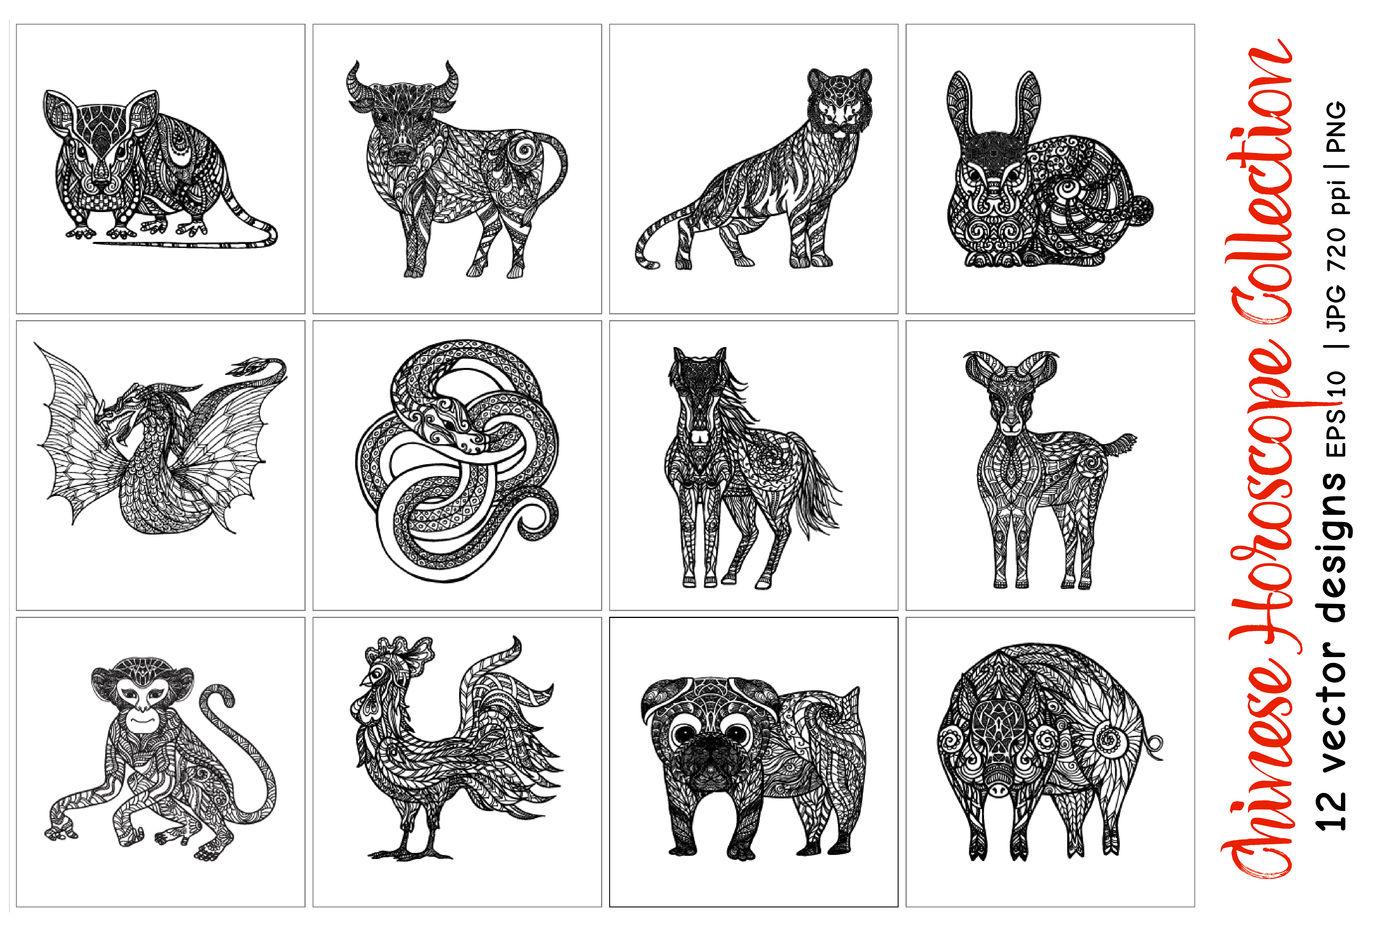 Chinese Horoscope Collection By Elen Lane Thehungryjpeg Com